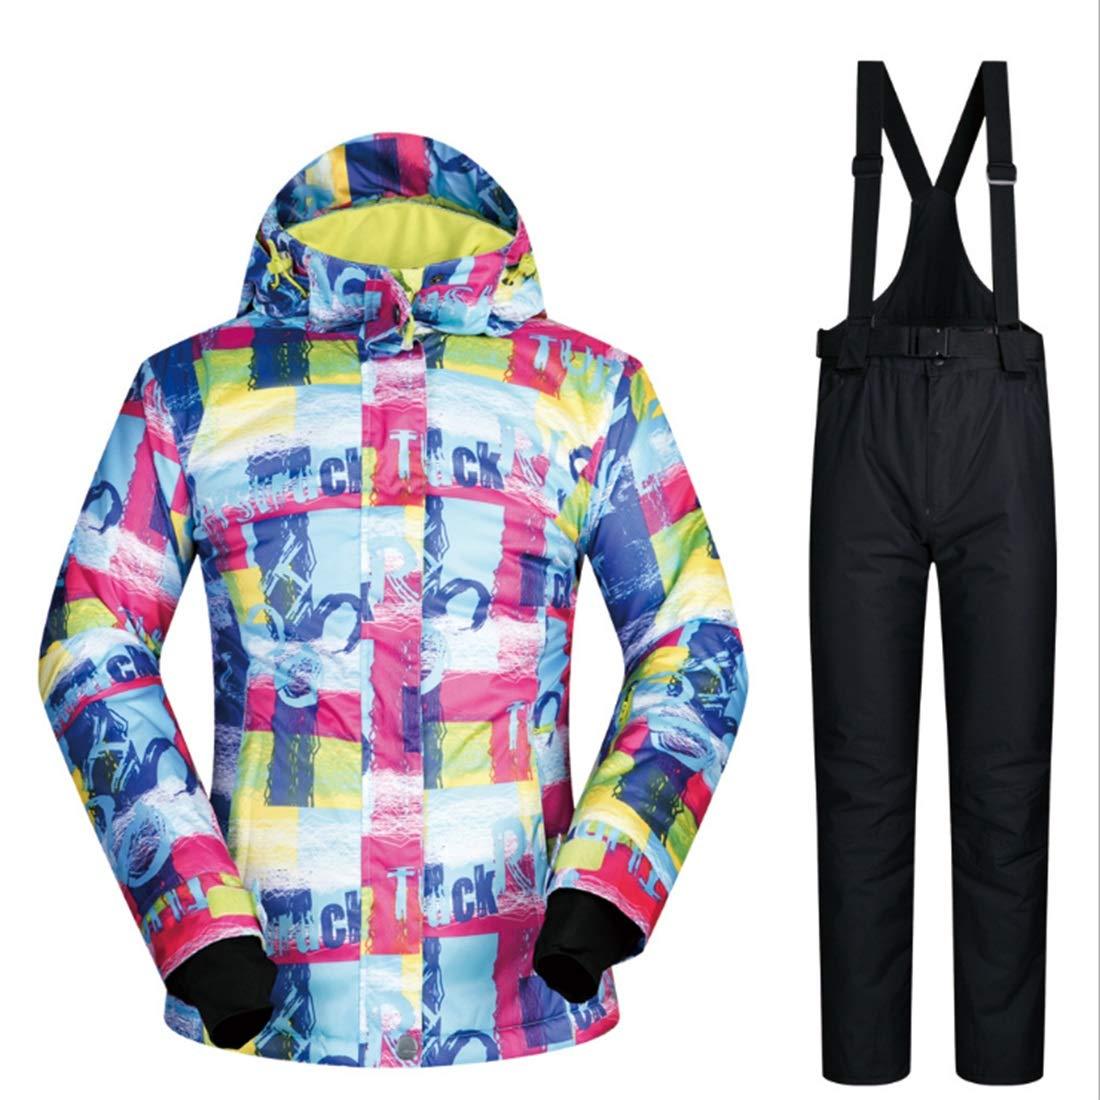 2 Sububblepper Women's Ski Jacket Snowboard Waterproof Windproof Snow Jacket for Rain Snow Outdoor Hiking (color   06, Size   L)